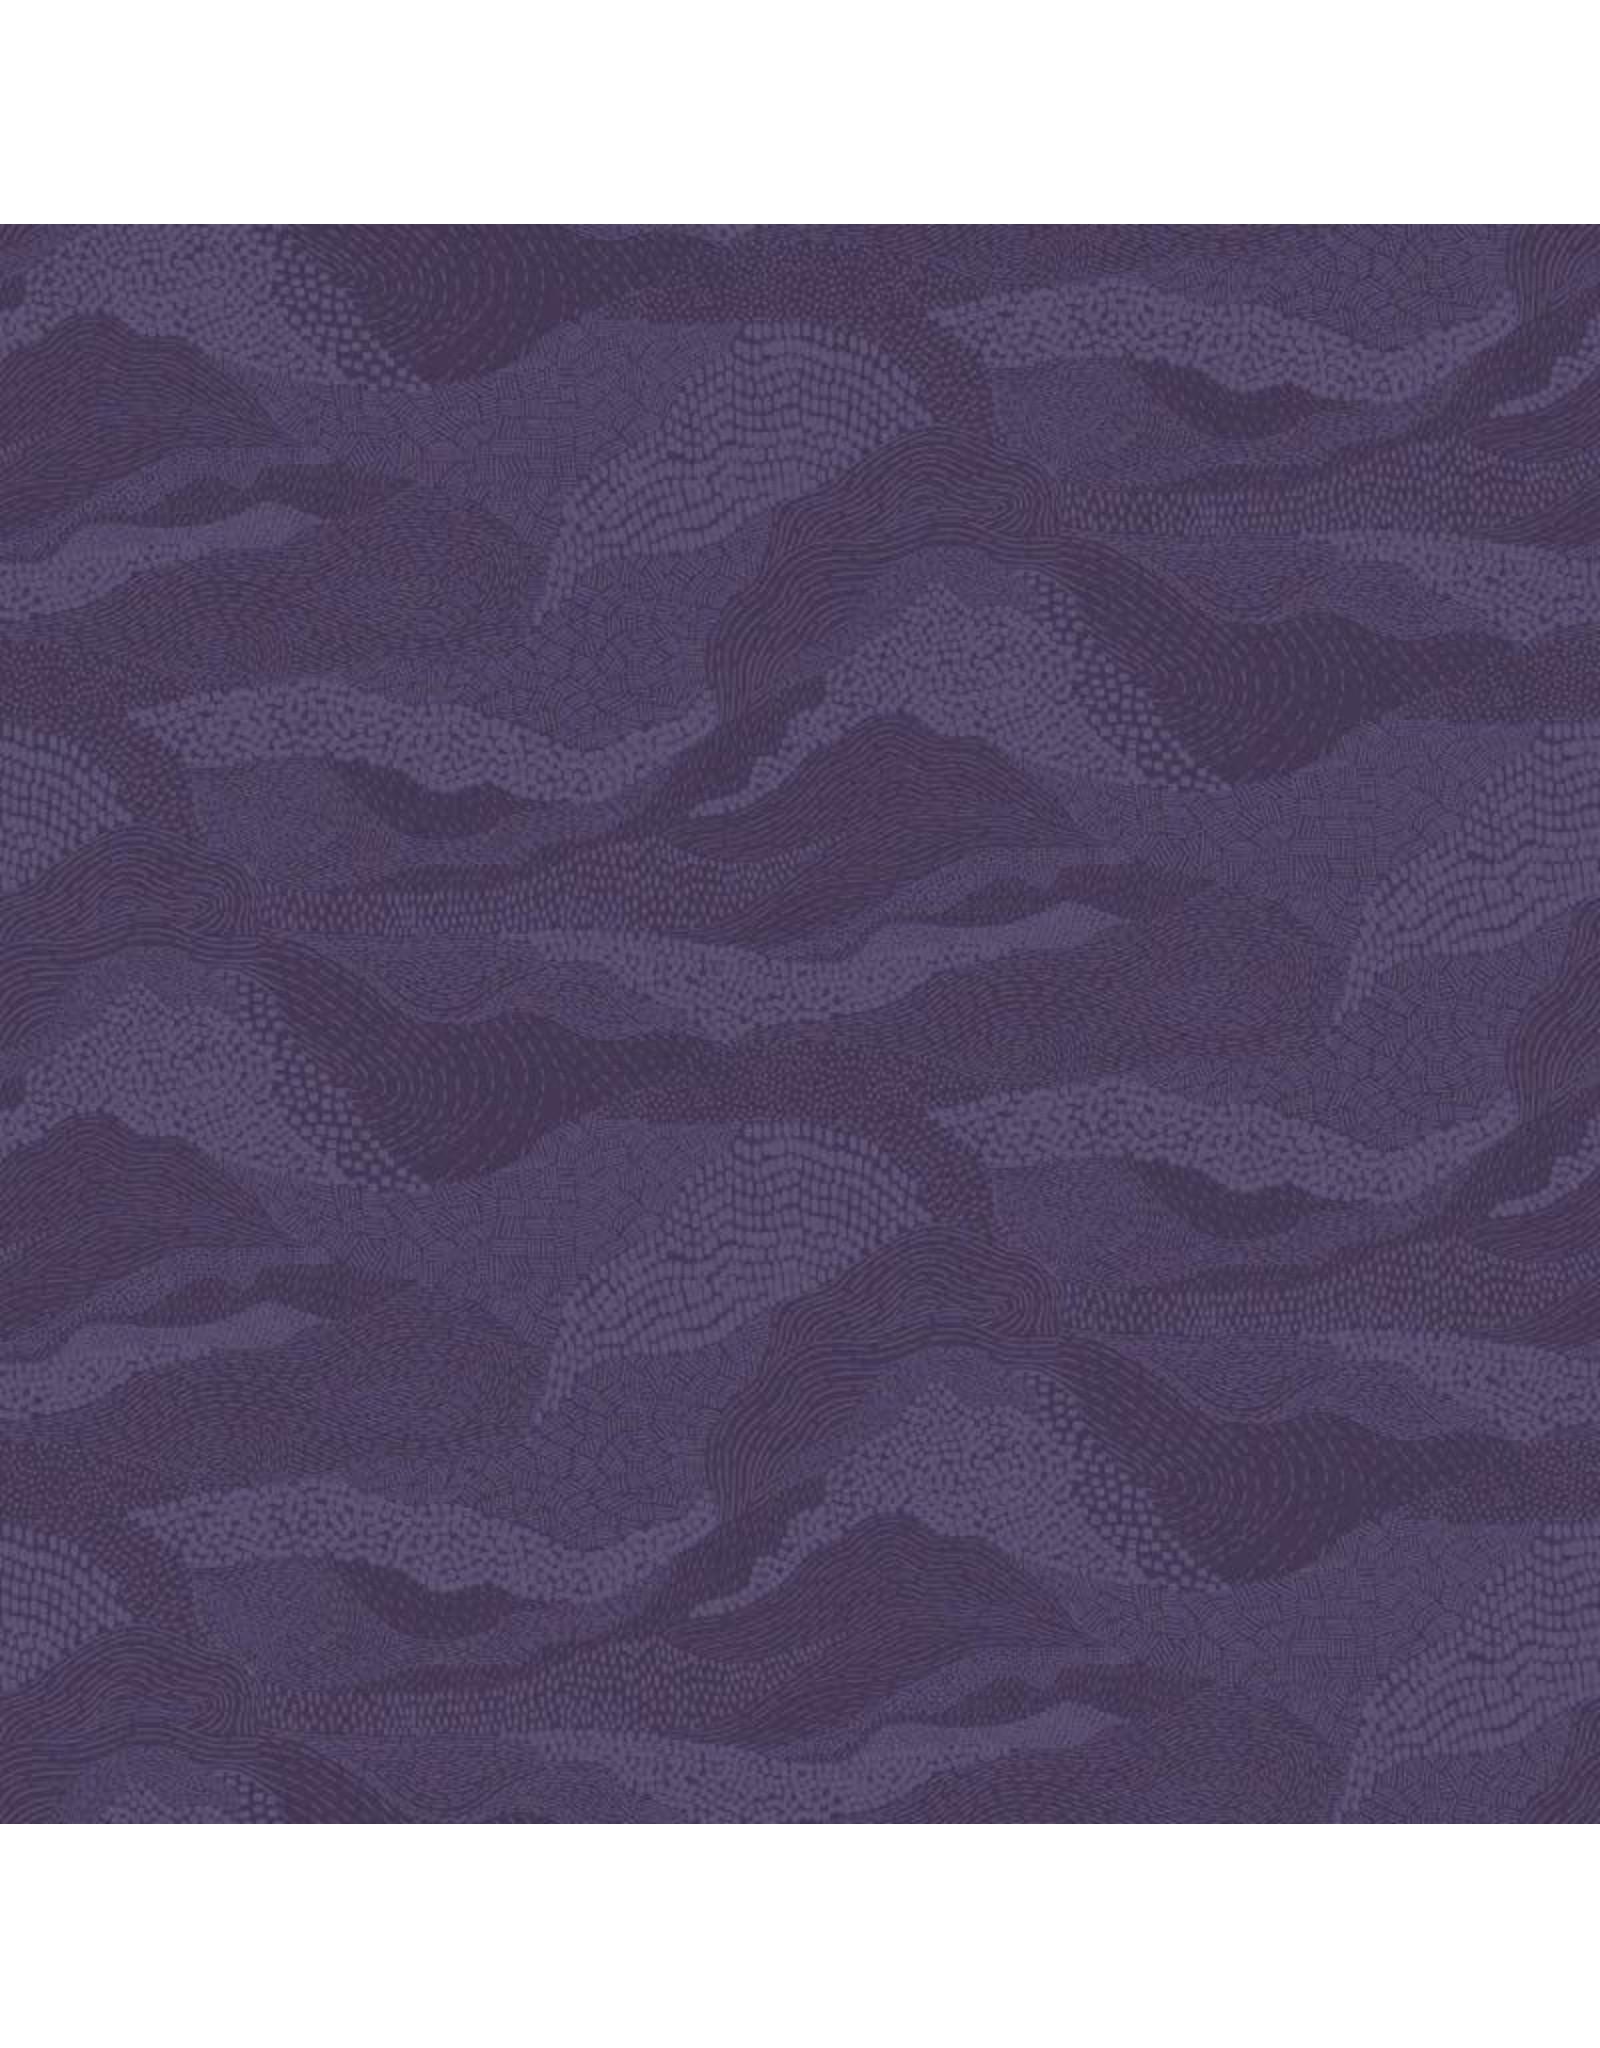 Figo Elements, Earth in Purple, Fabric Half-Yards 92007-87